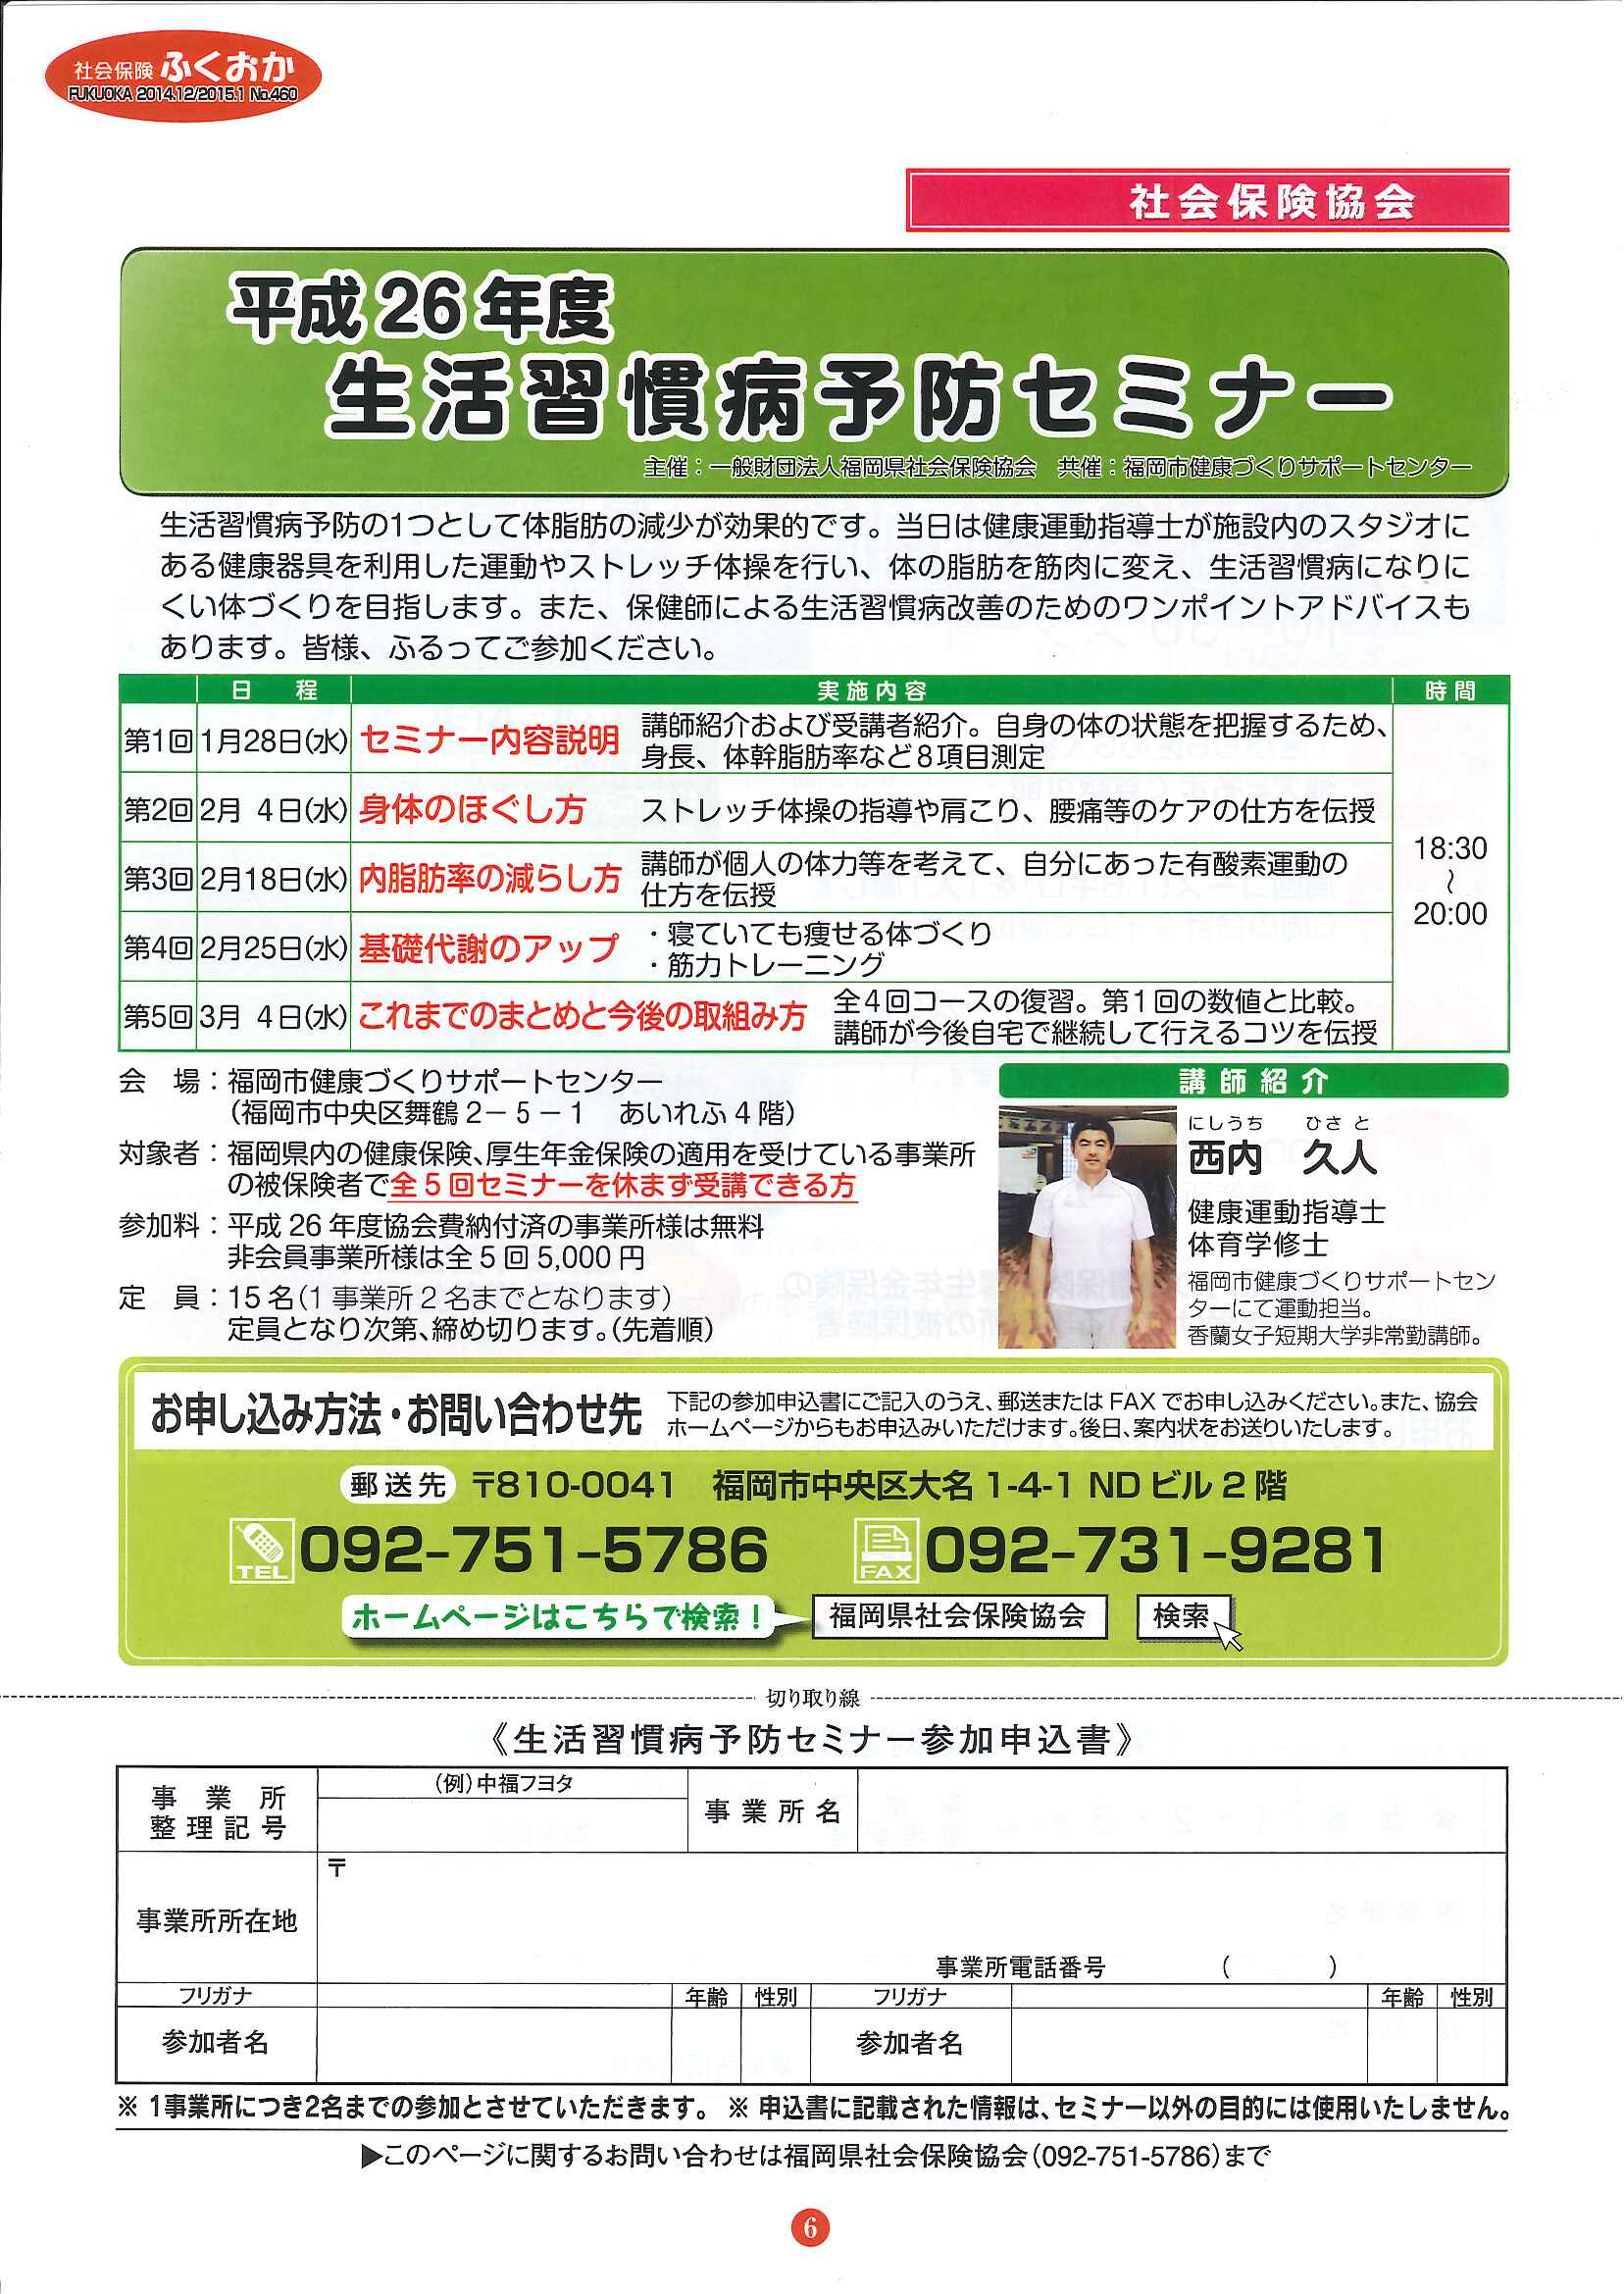 H27年1月予定/社会保険「ふくおか」/年末年始事務局休み_f0120774_1264132.jpg